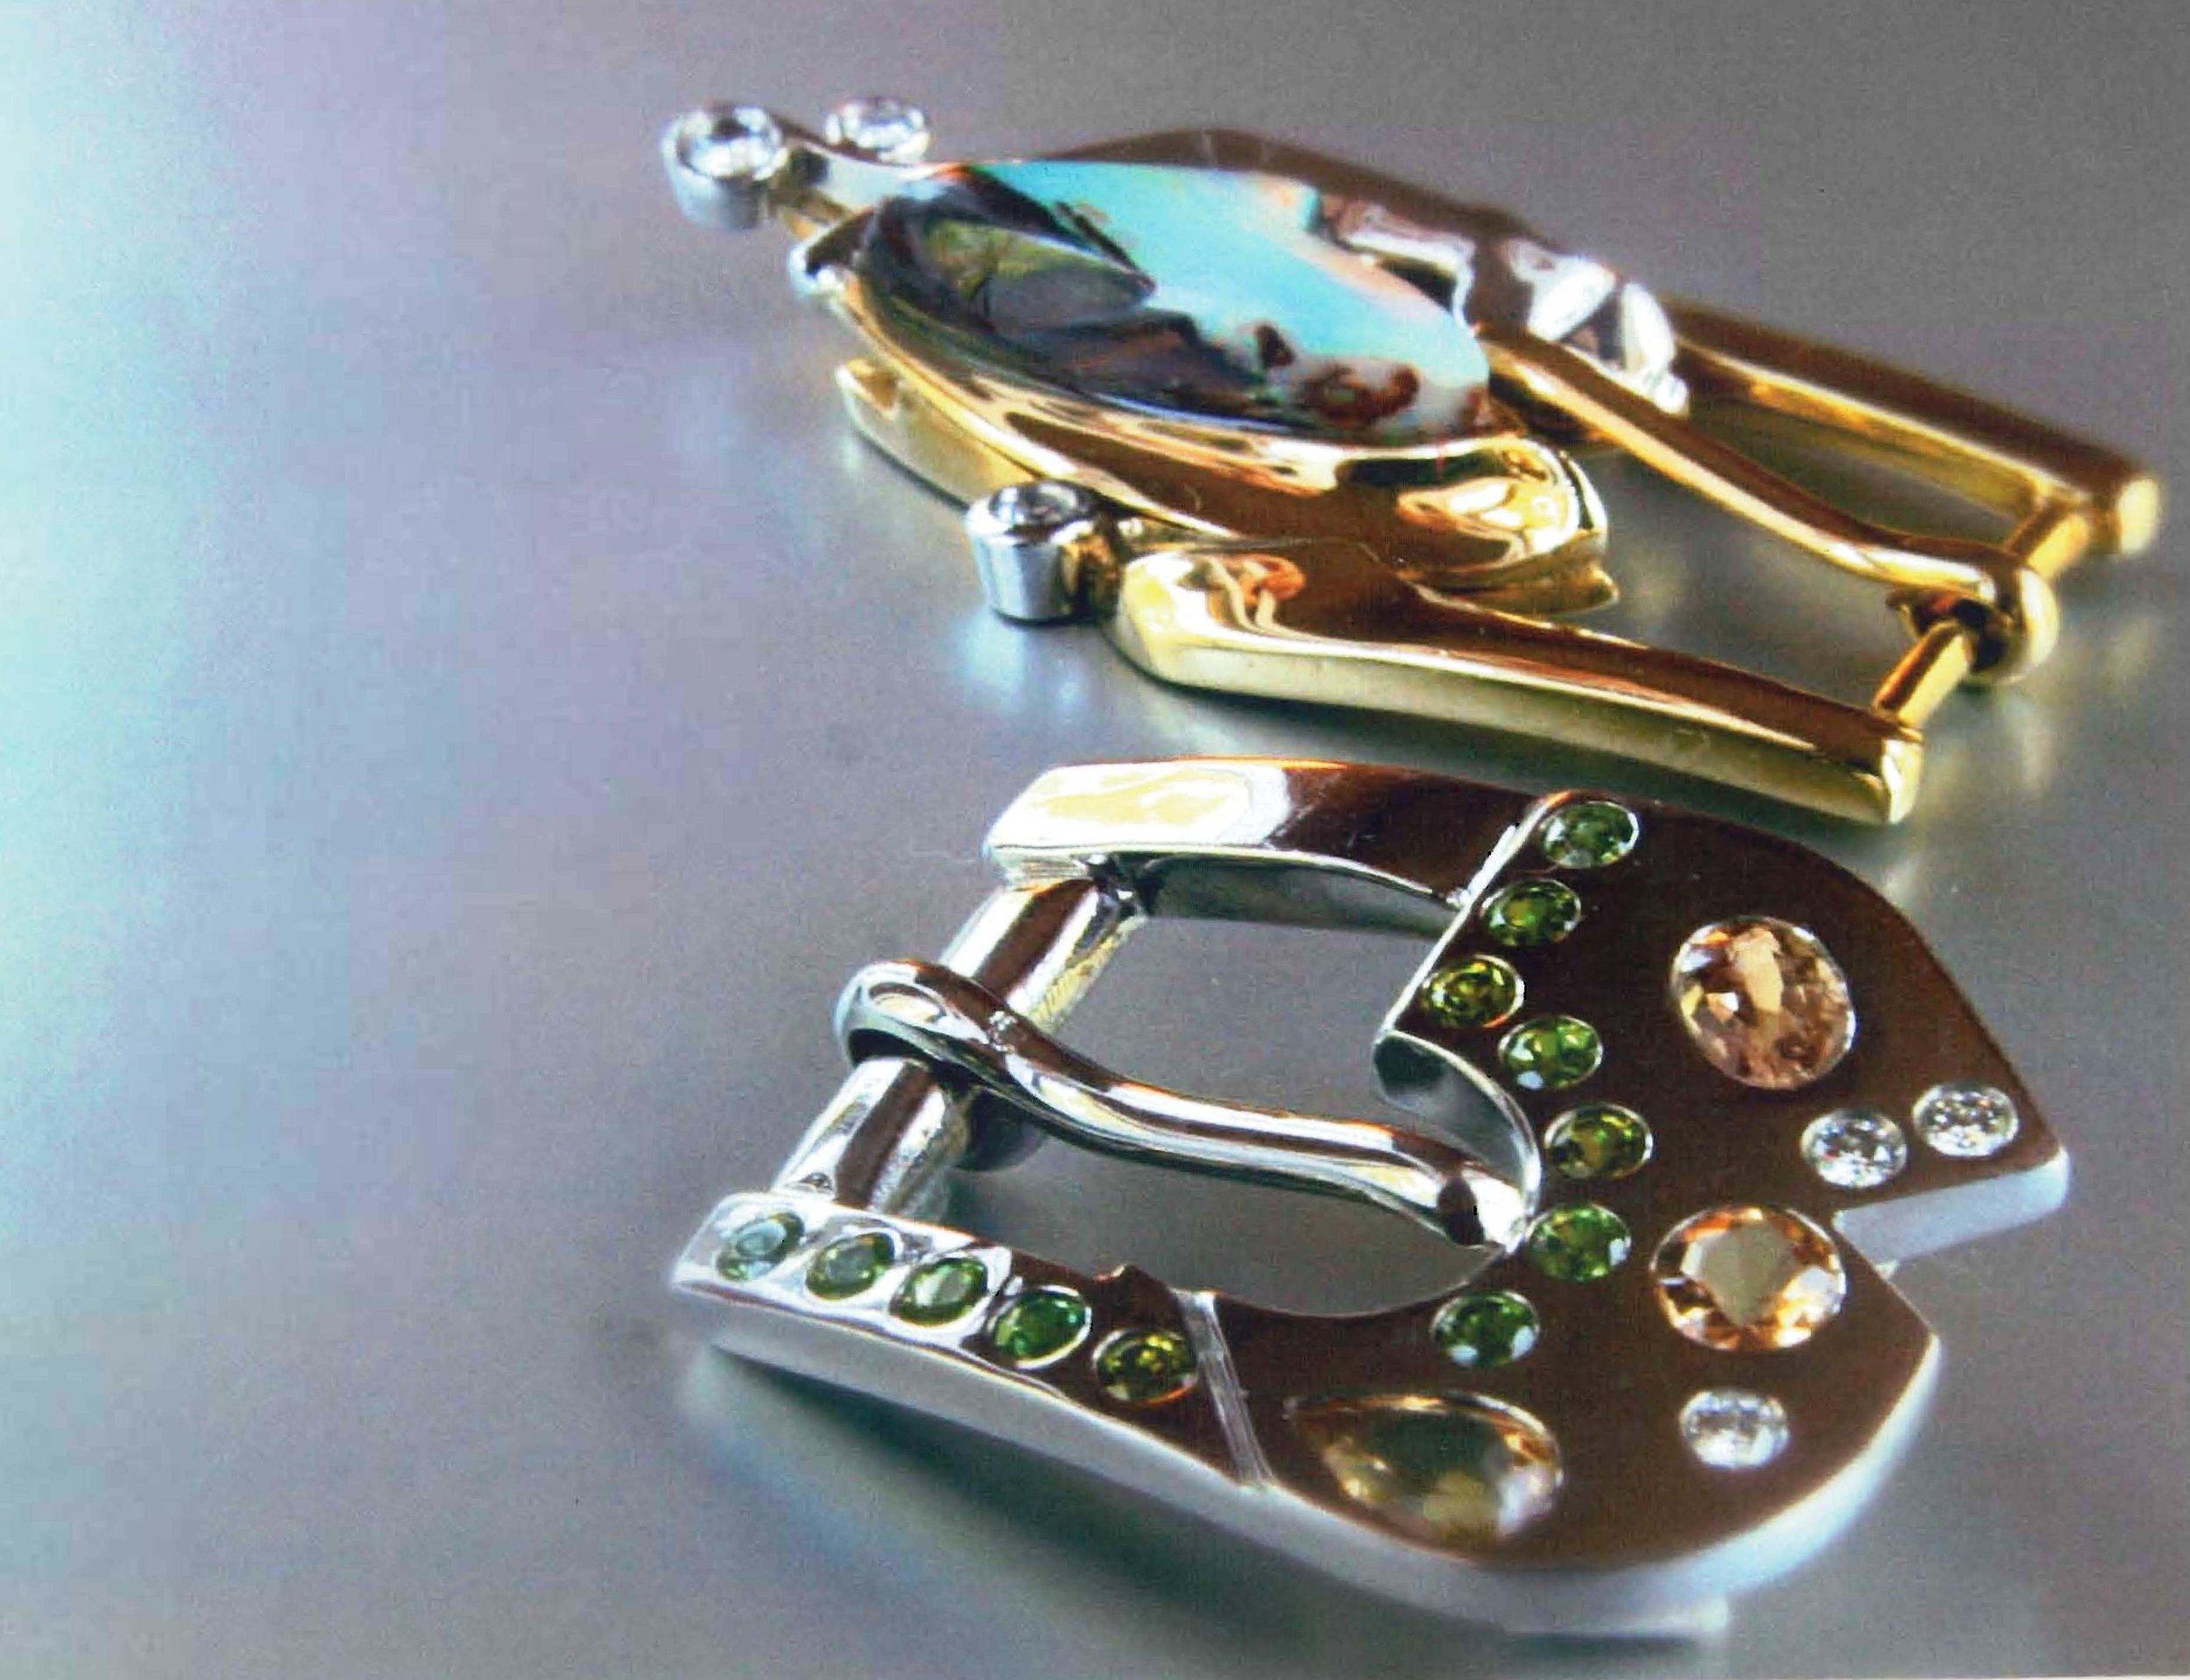 18kt Buckle Opal & Diamonds, 18kt WG Buckle  Semi-Precious Stones & Diamonds